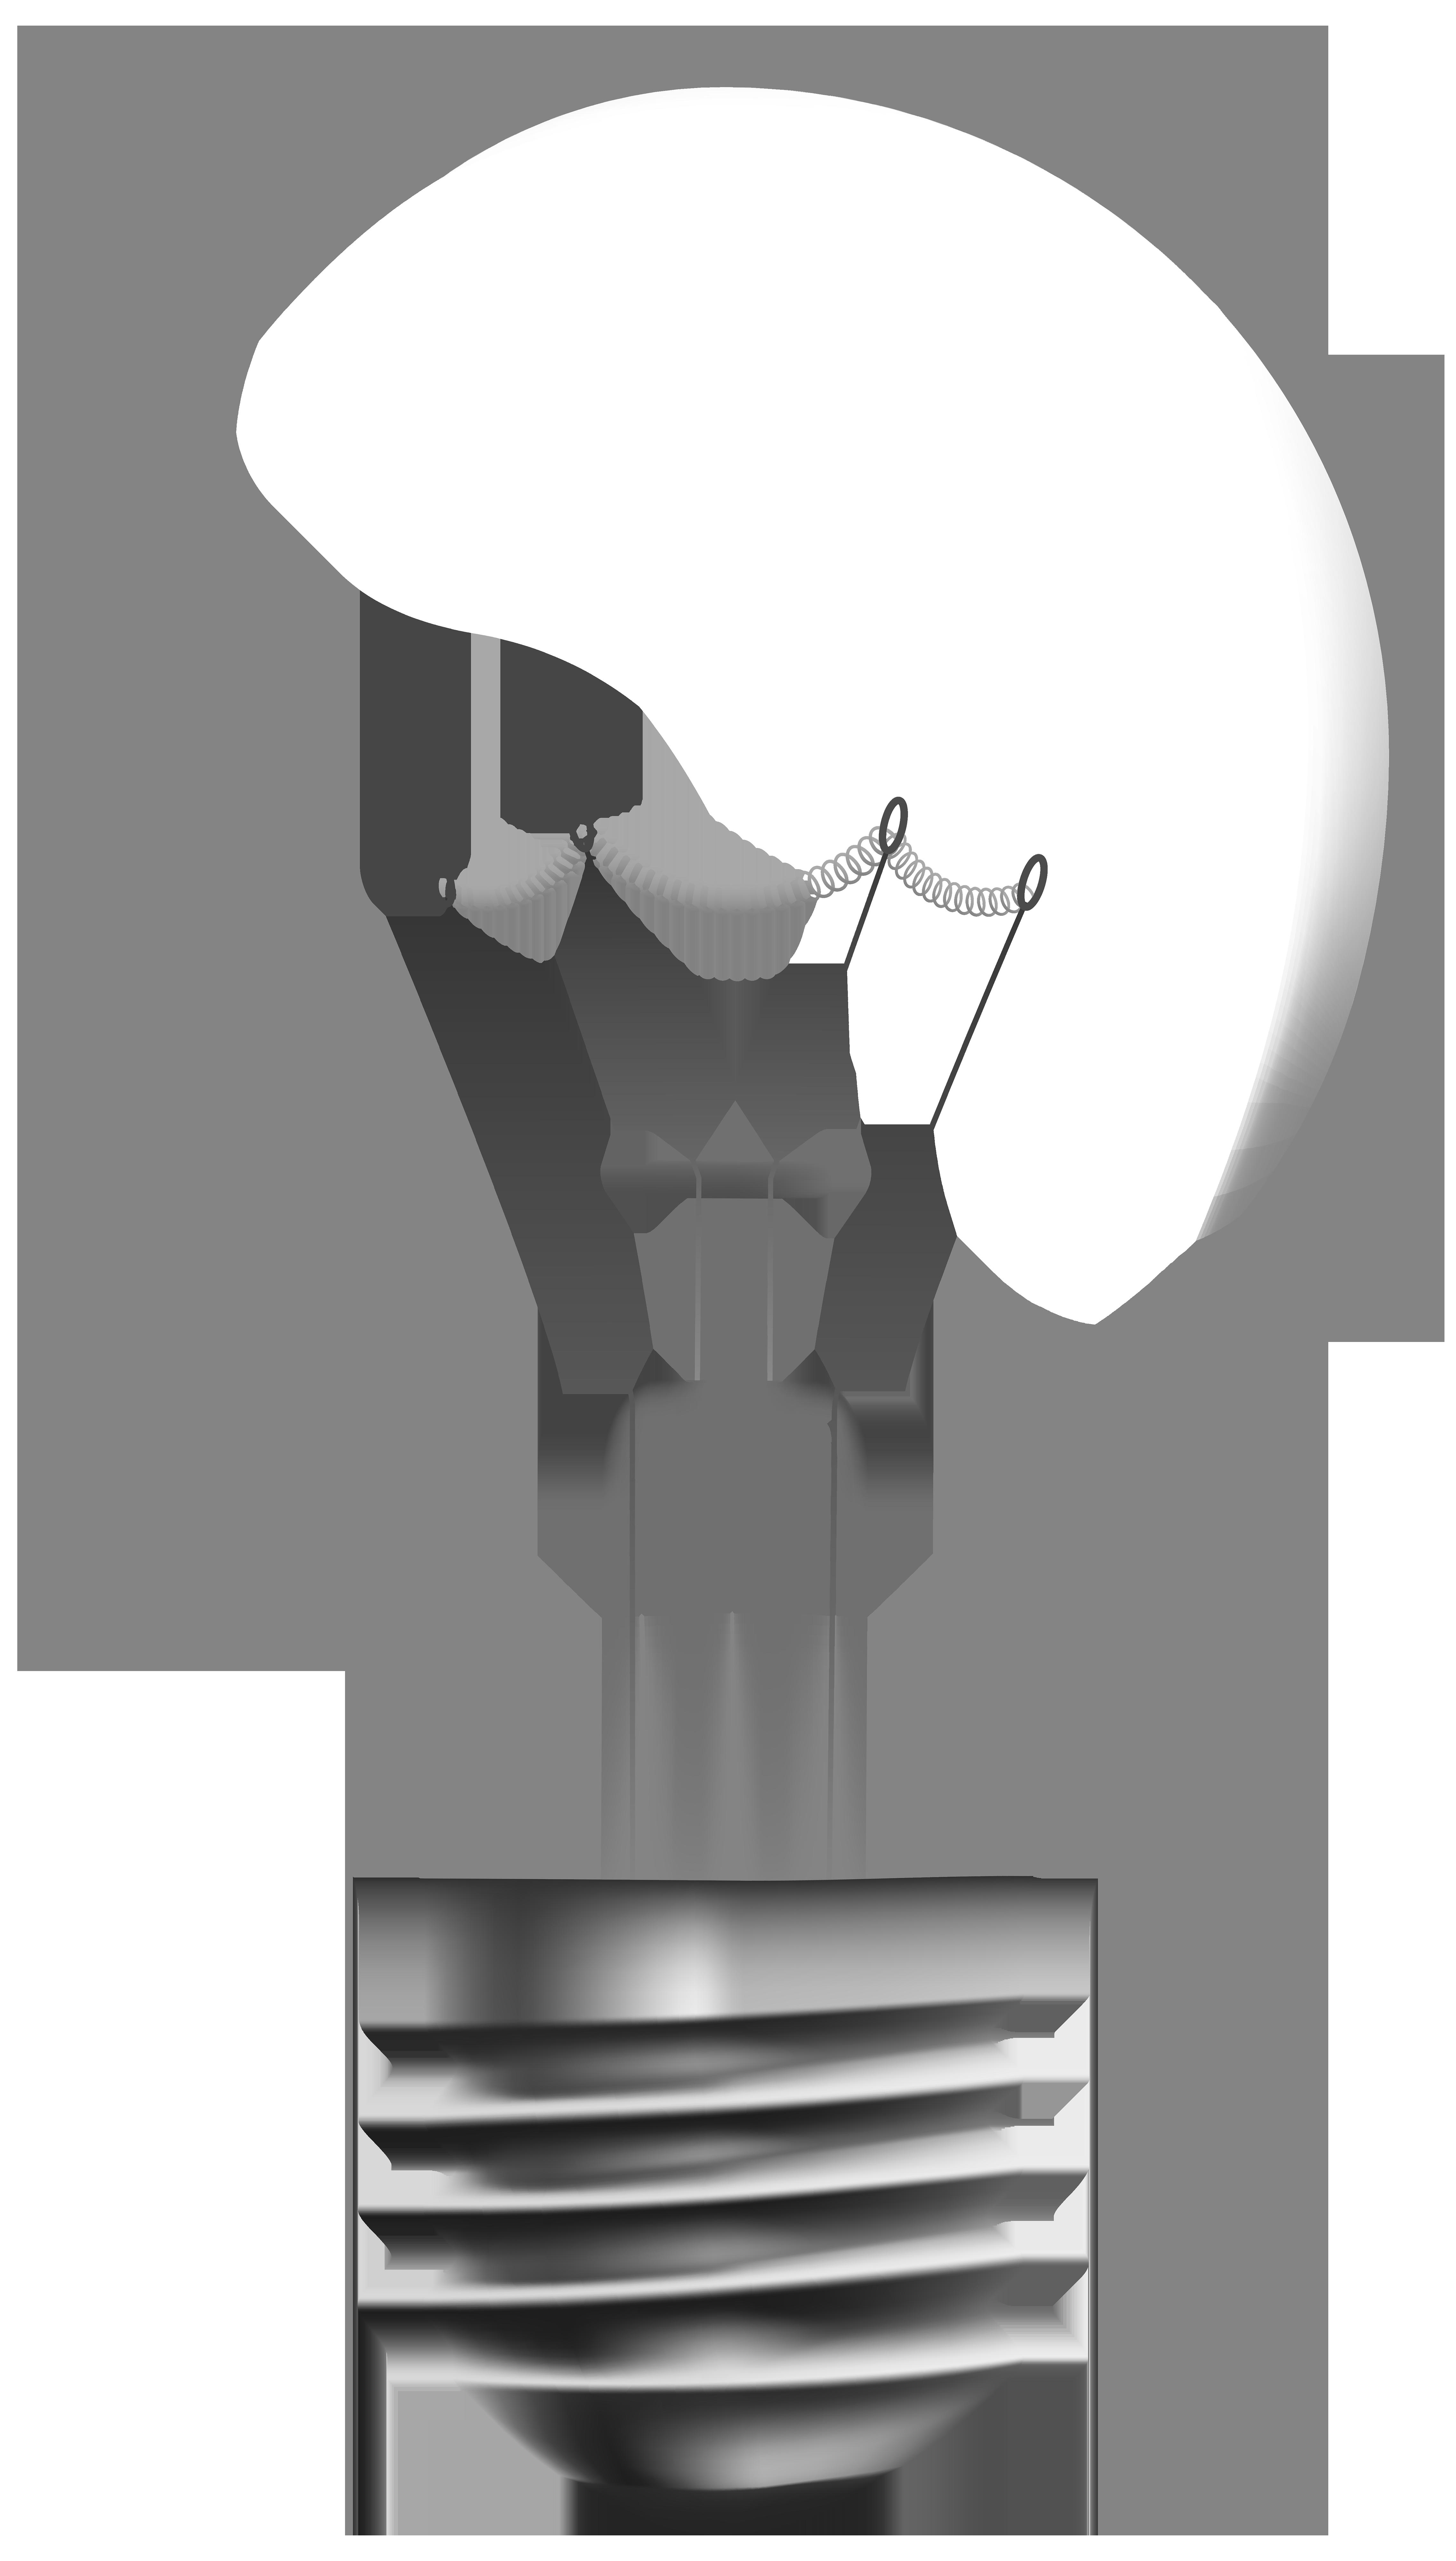 Lamp clipart light. Transparent bulb png clip